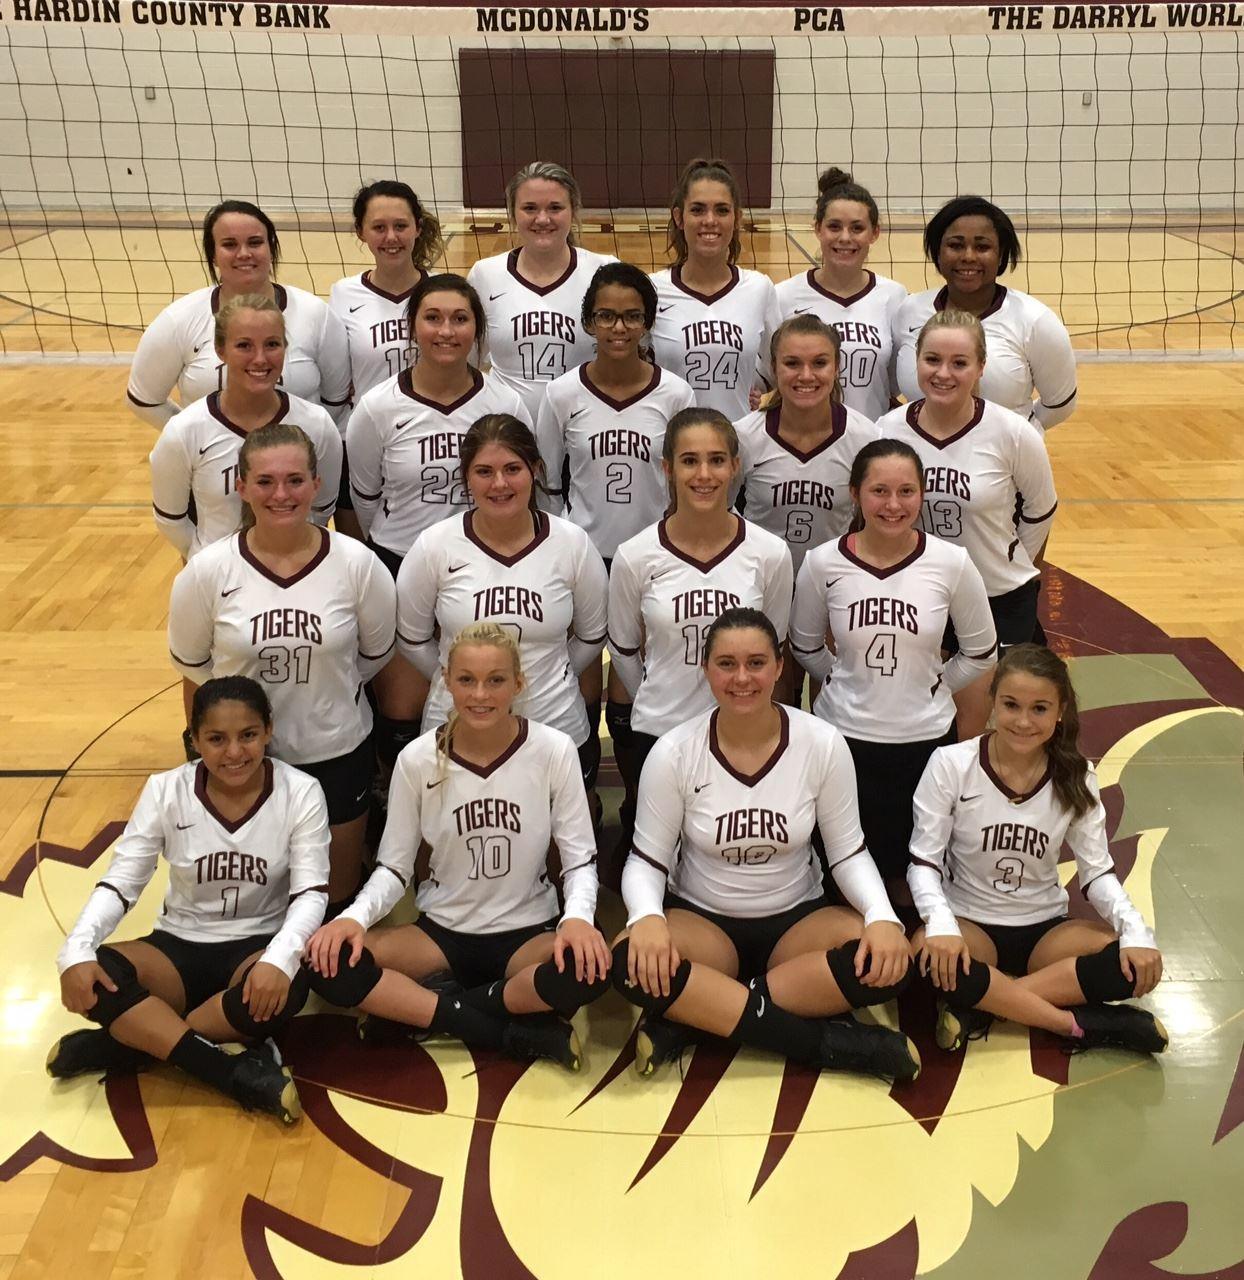 fe893c72e8 Hardin County High School Volleyball - Hardin County High School ...